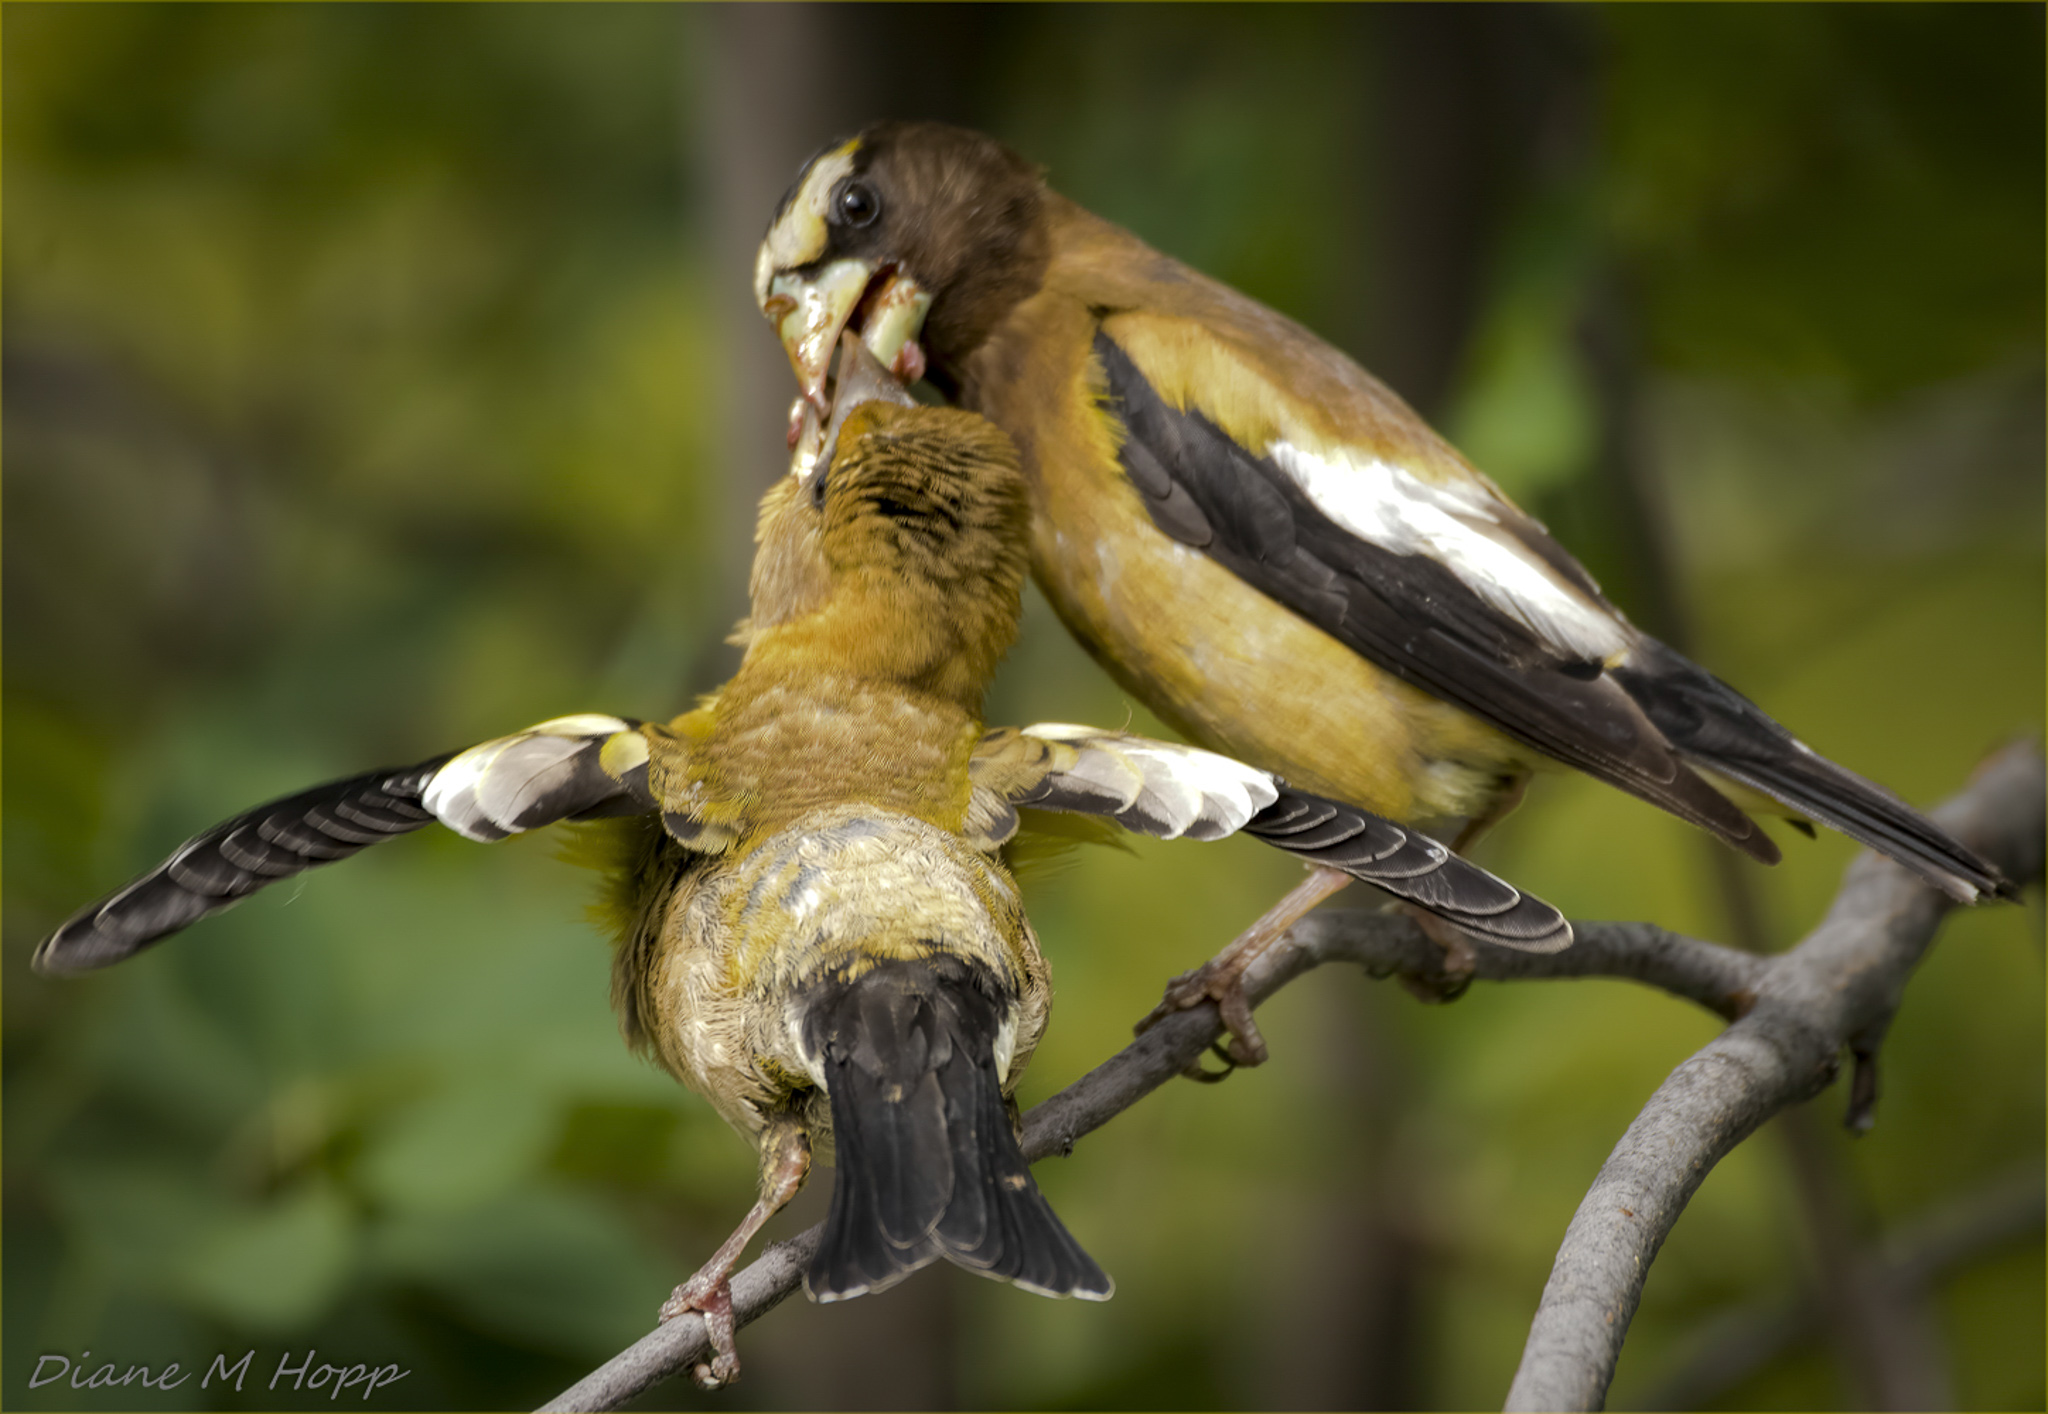 Evening Grosbeak Feeding Baby - DMHopp